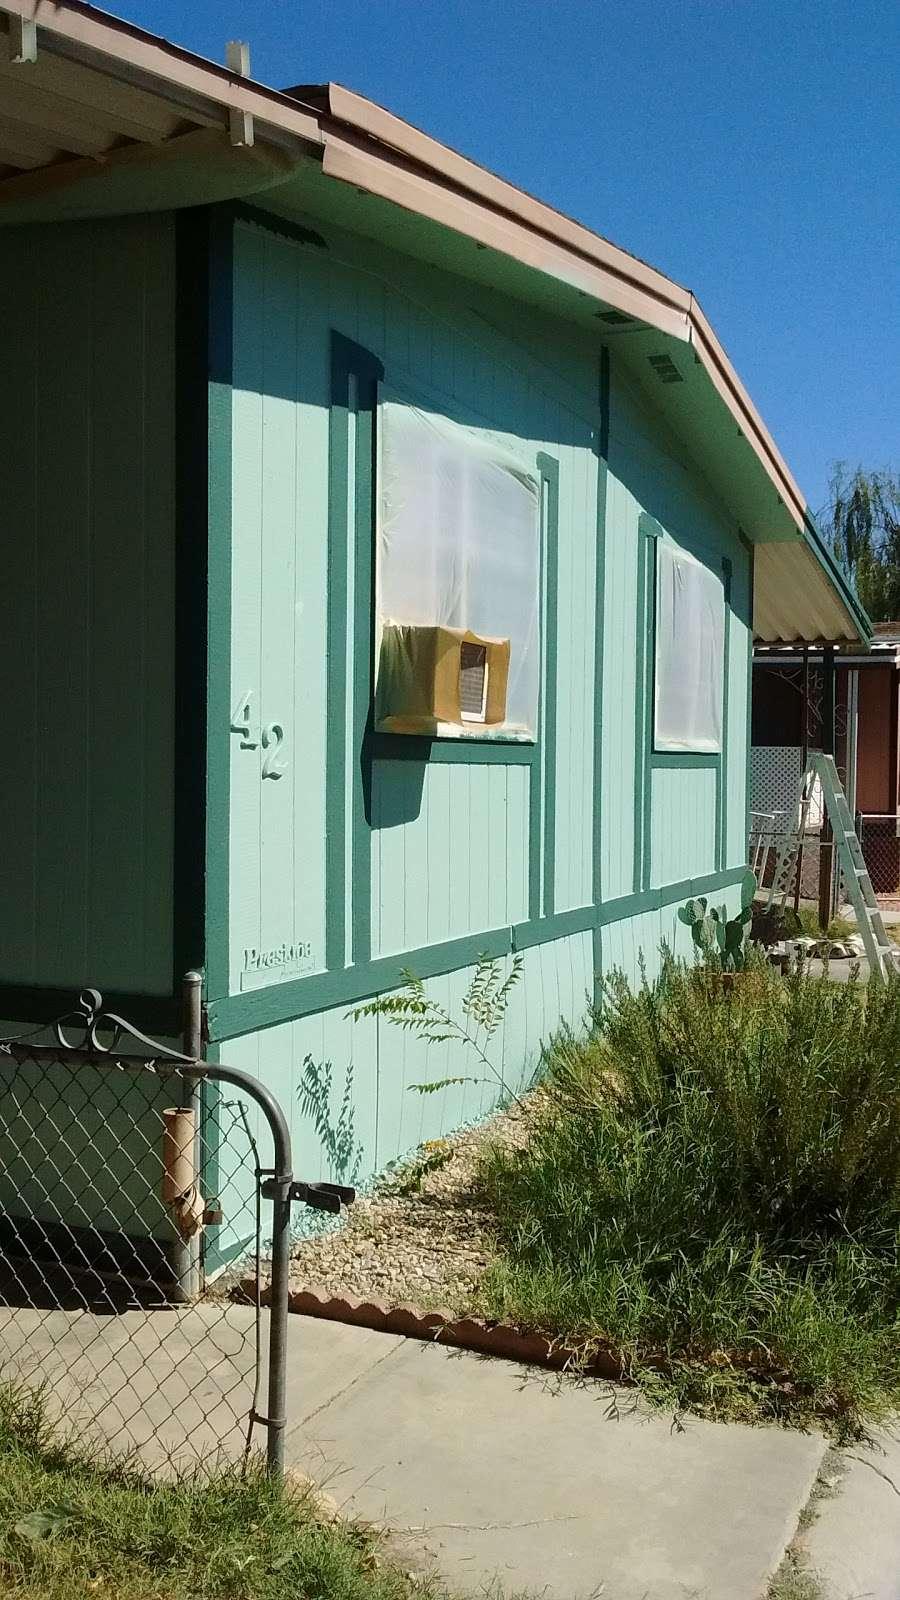 Hacienda Mobile Estates - rv park  | Photo 8 of 10 | Address: 2330 E Ave J 8, Lancaster, CA 93535, USA | Phone: (661) 945-1597